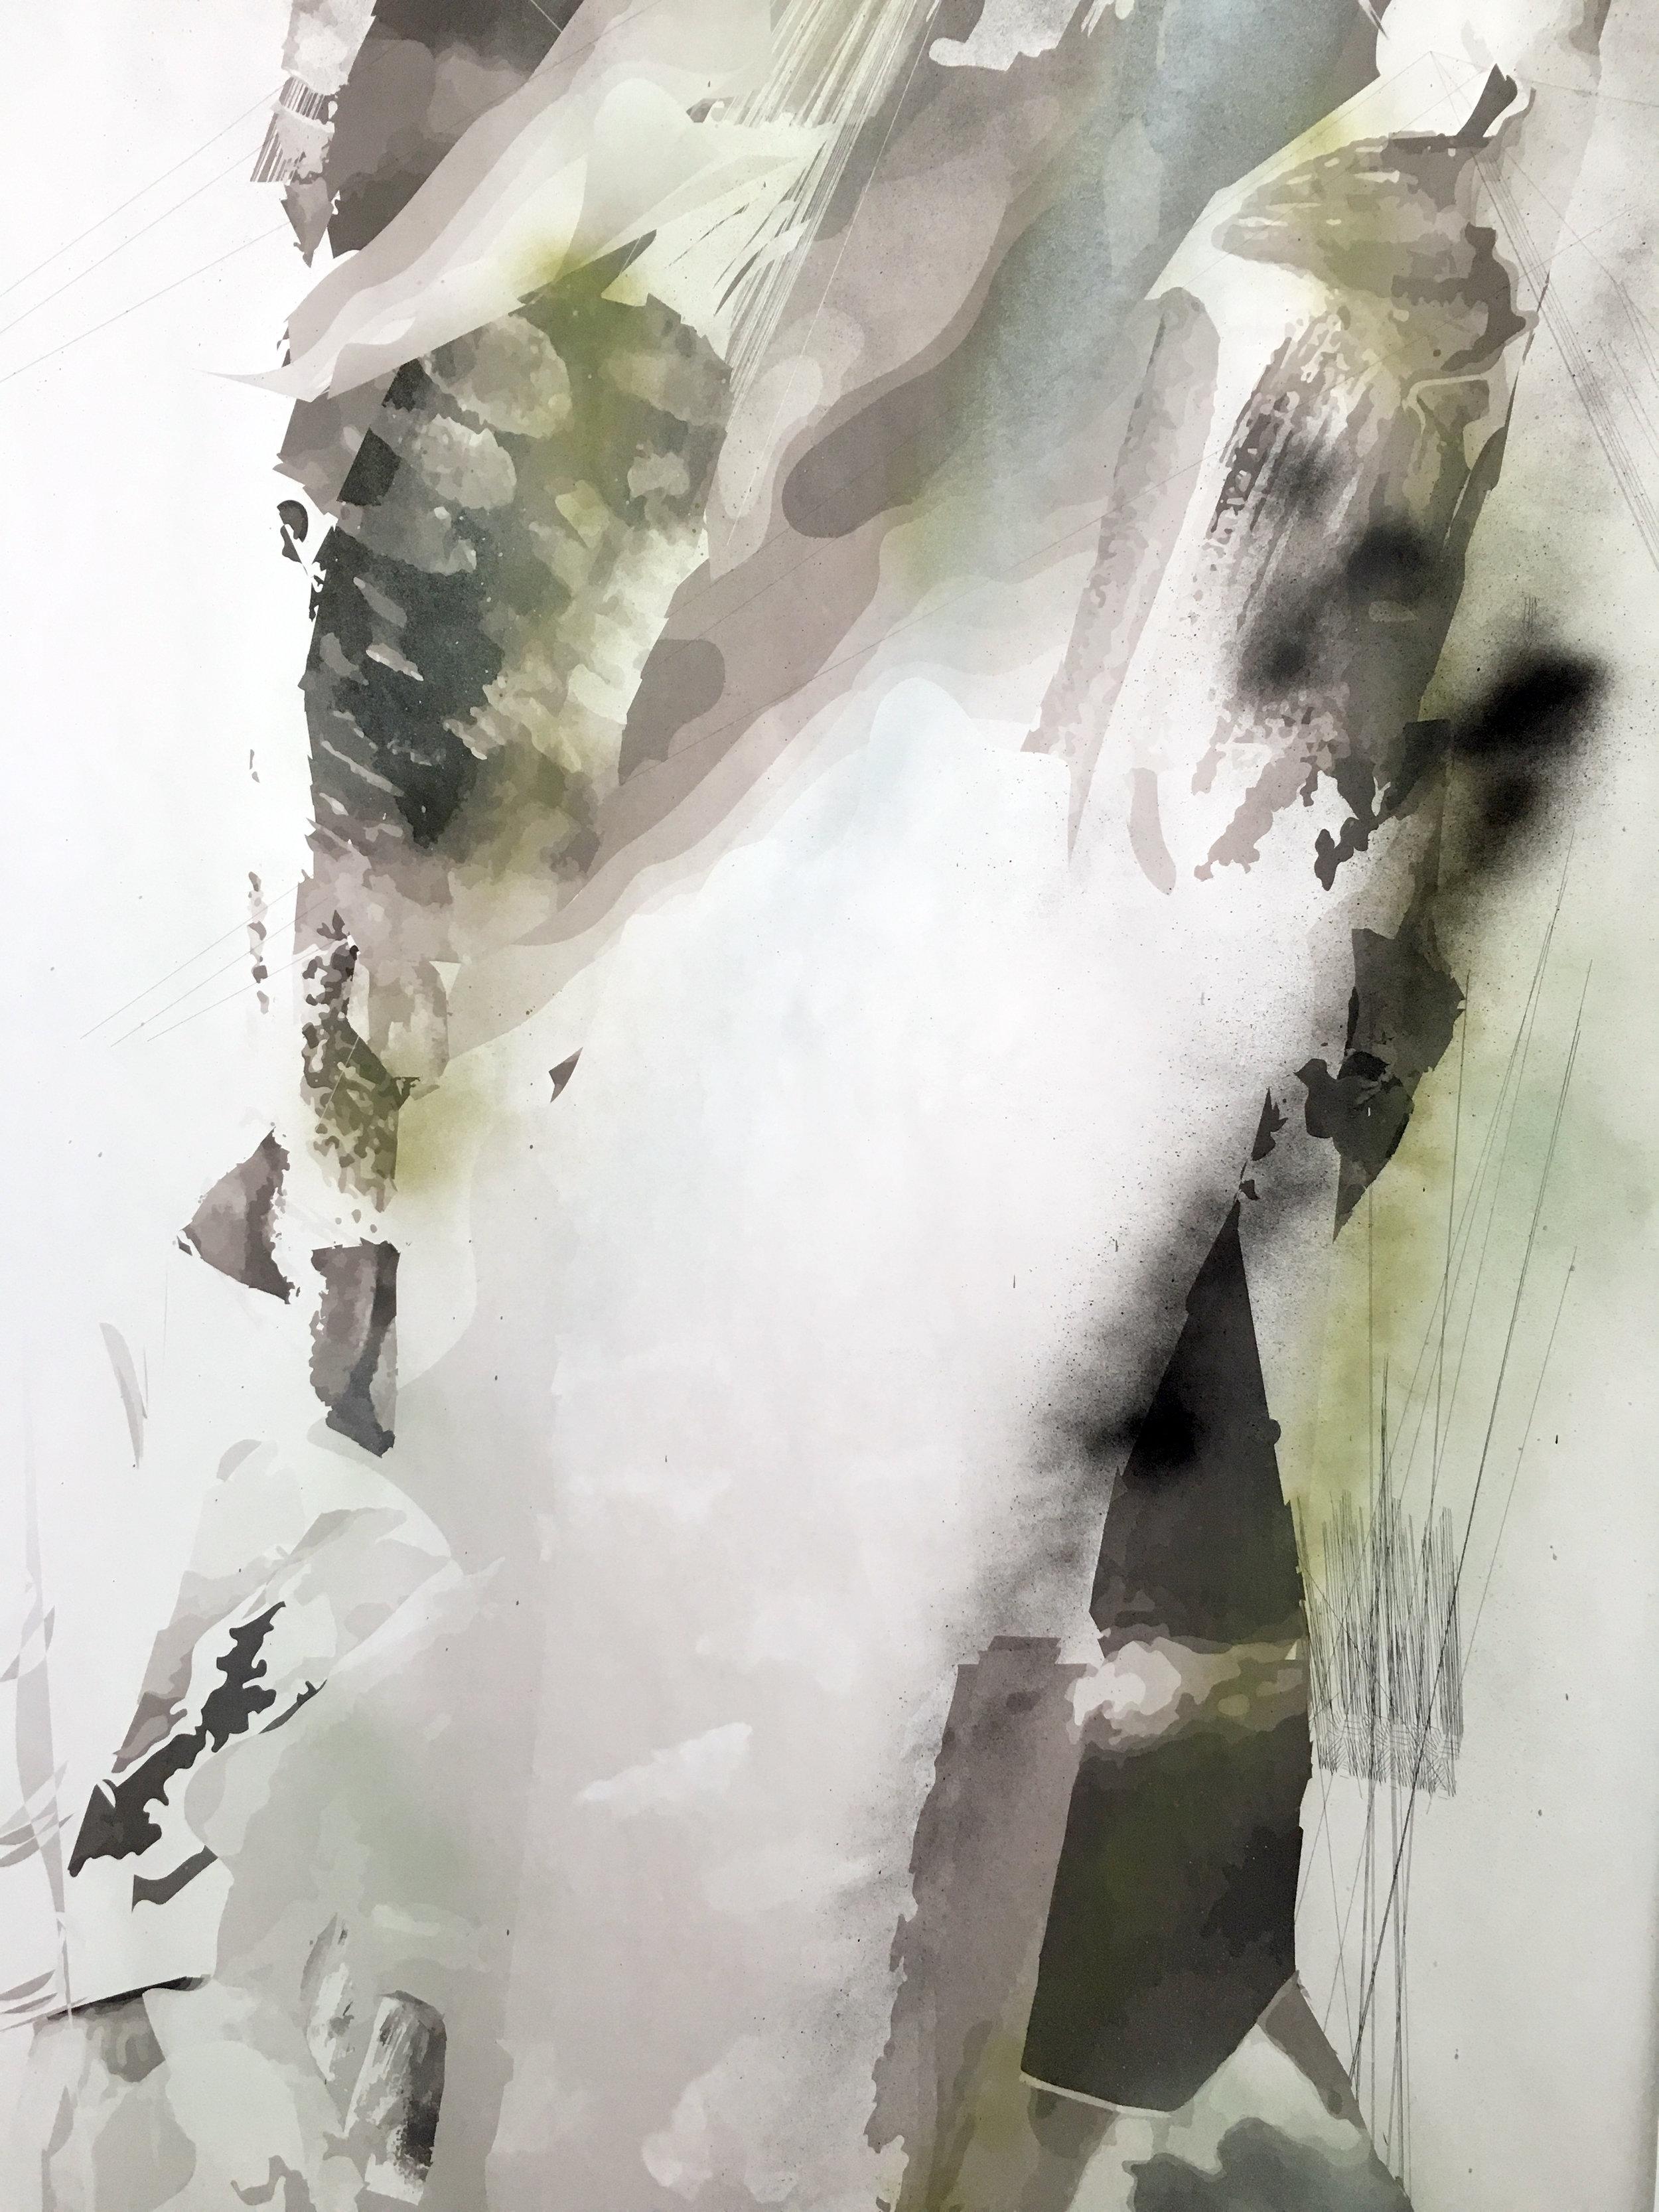 The Philosopher Walks (detail, waterfall)